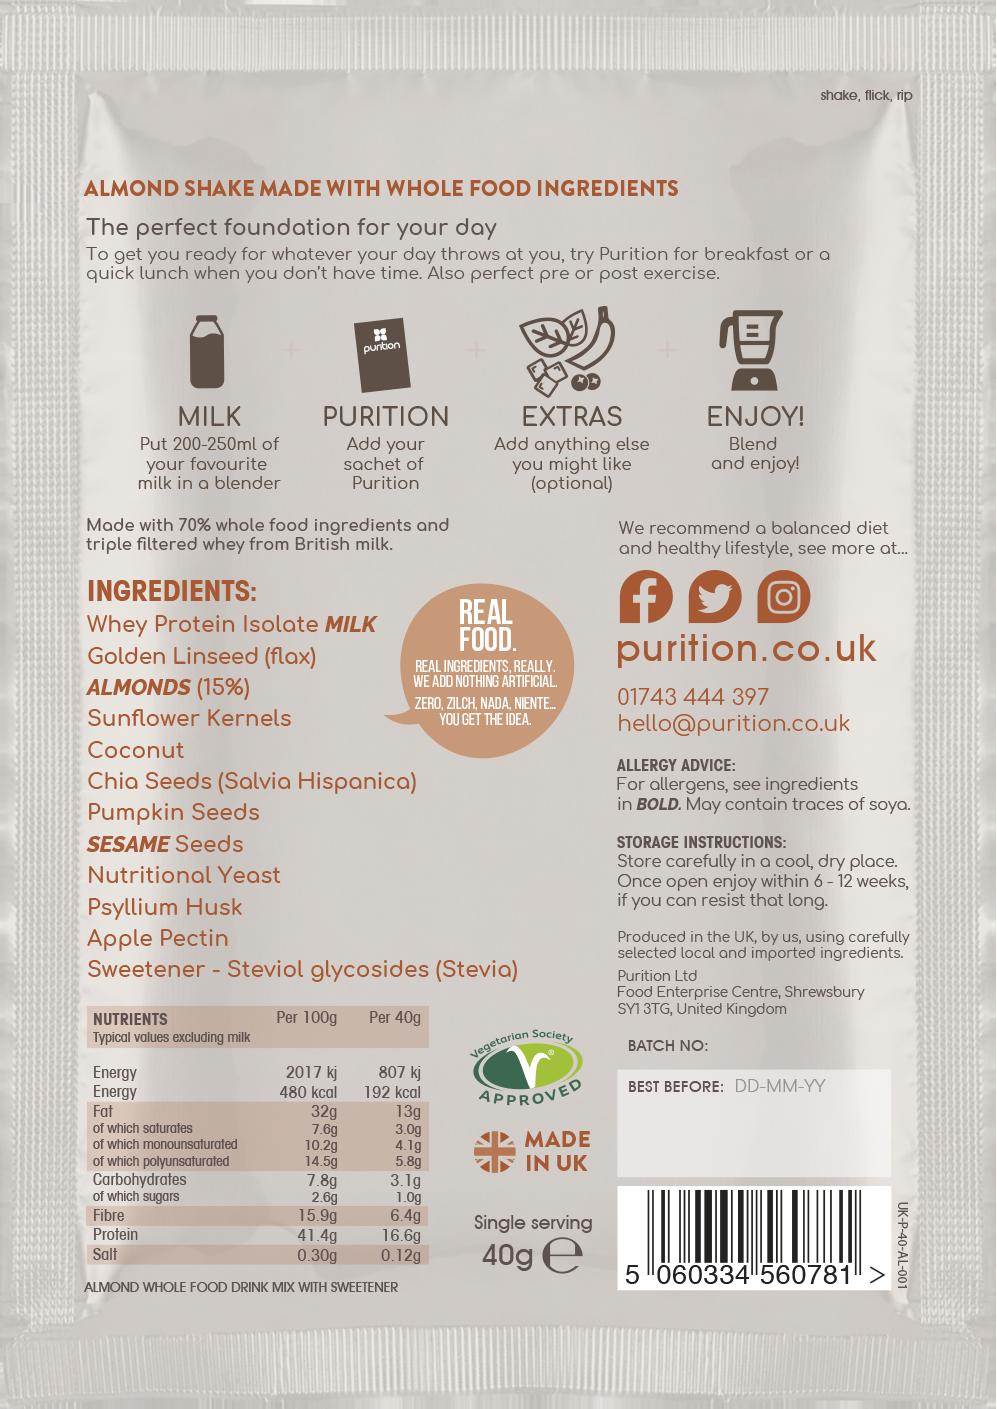 Wholefood Nutrition With Almonds SINGLE SACHET 40g